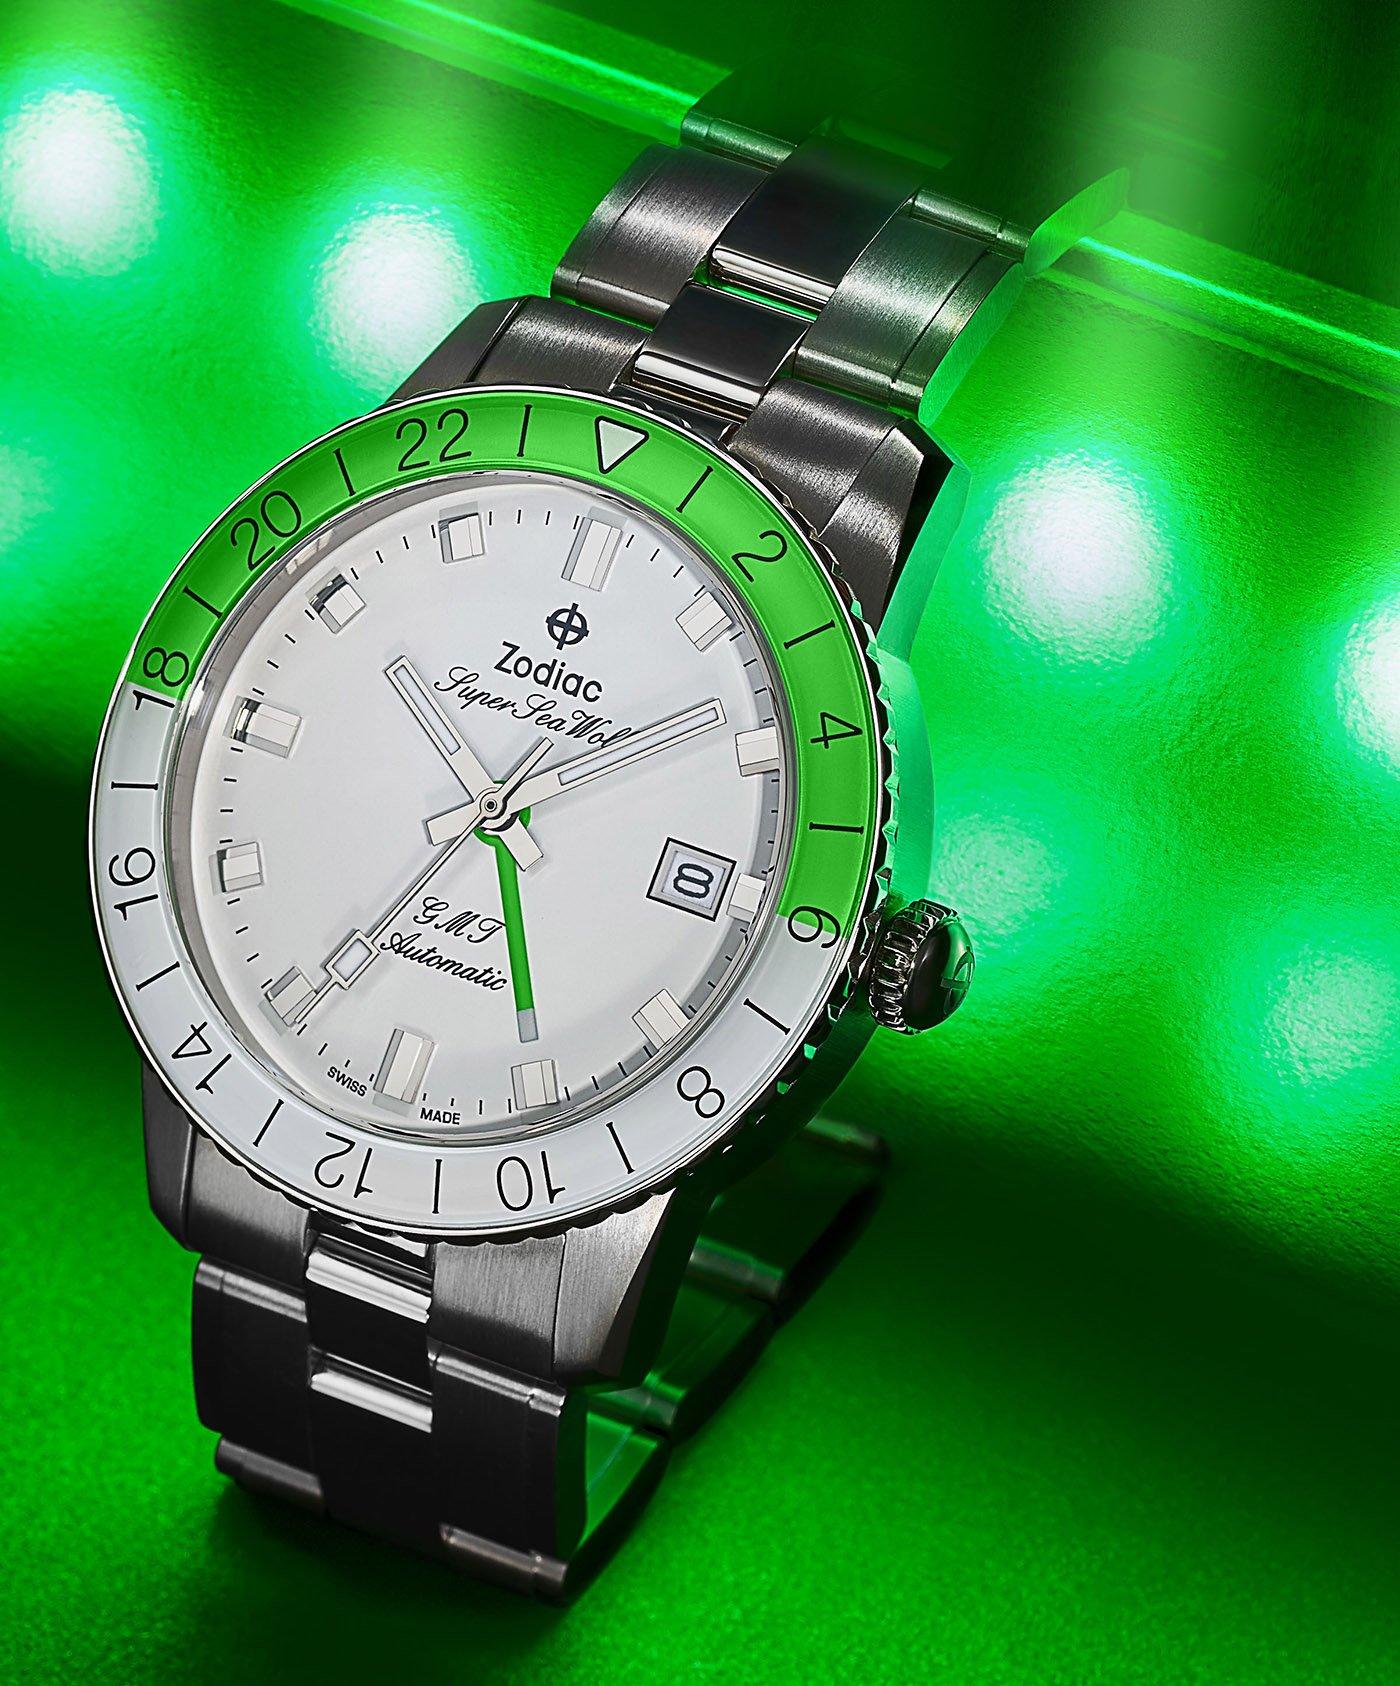 Zodiac представляет часы Super Sea Wolf 53 Neon и Super Sea Wolf GMT Neon